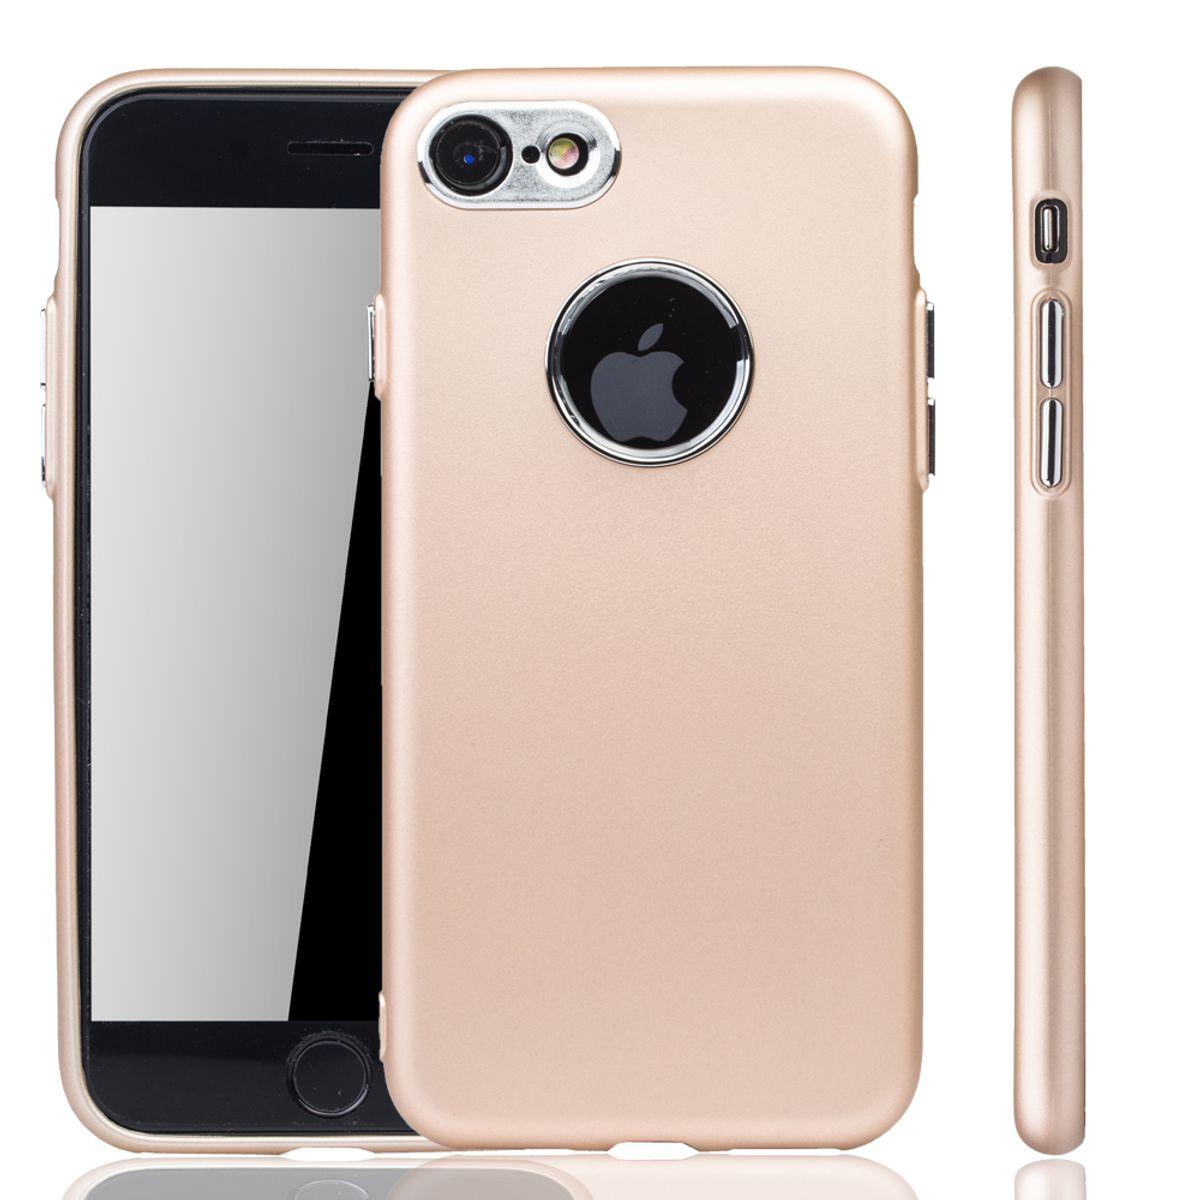 apple iphone 7 8 h lle handyh lle f r apple iphone 7 8 handy case in gold. Black Bedroom Furniture Sets. Home Design Ideas